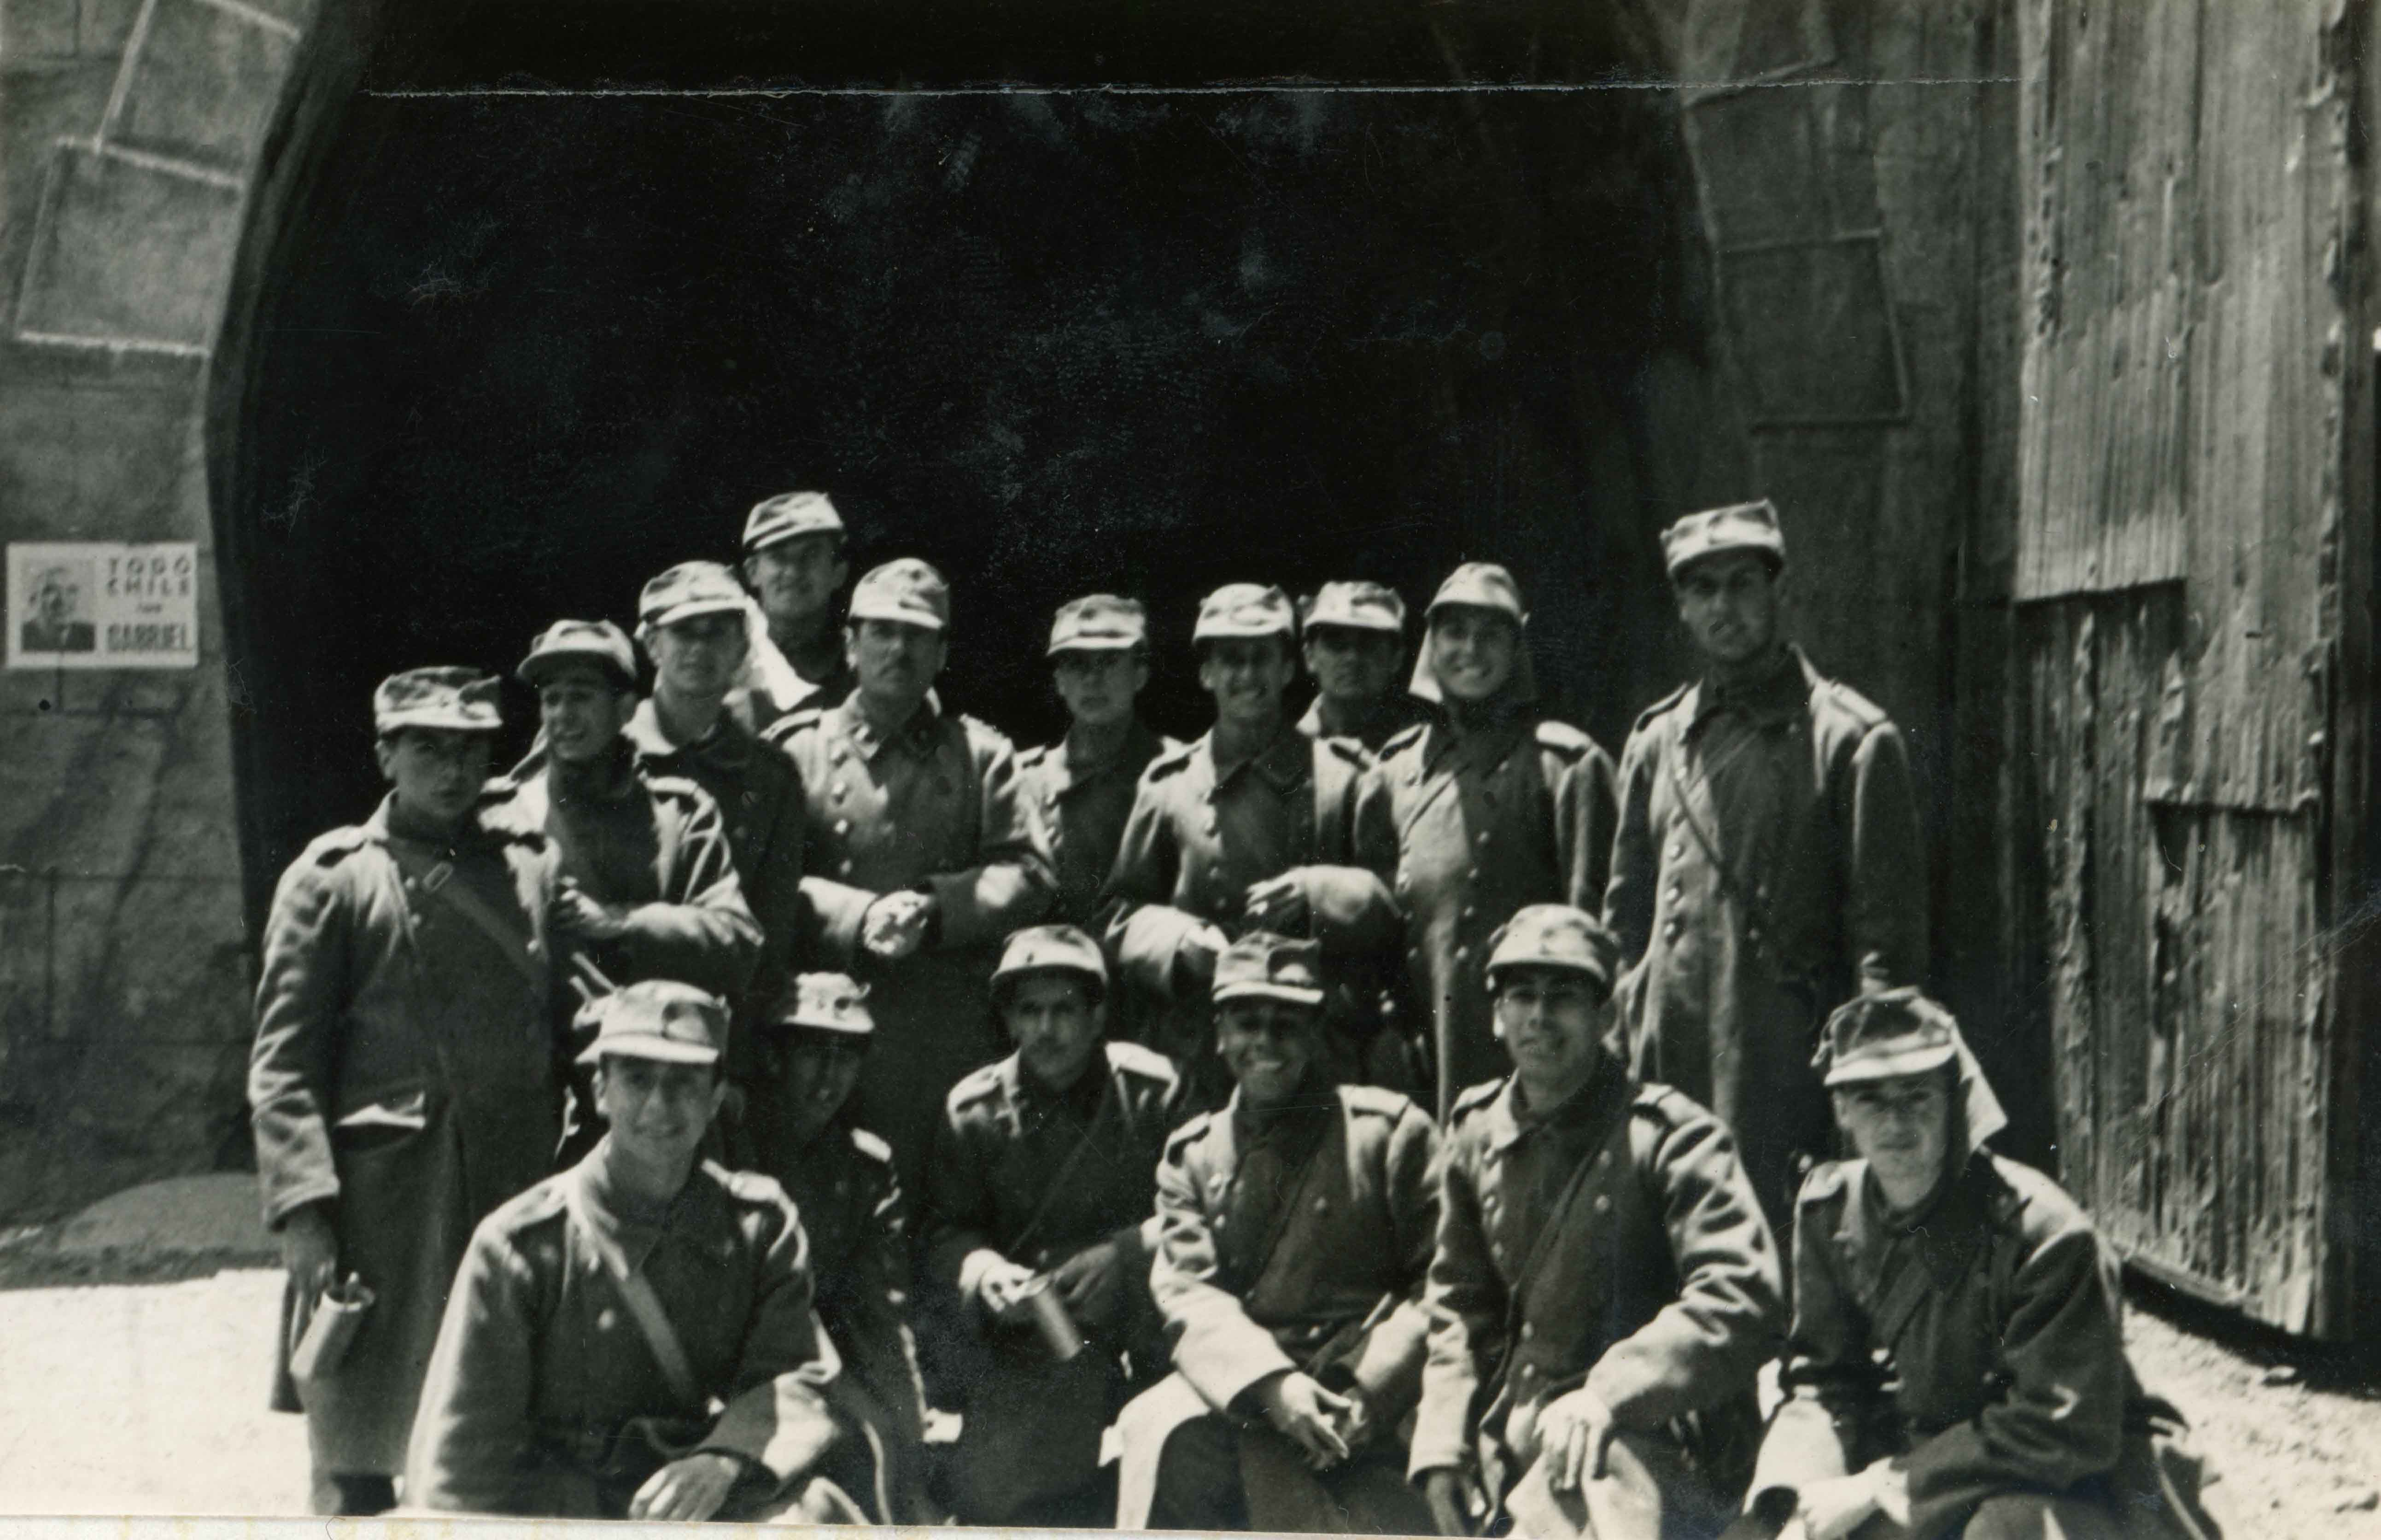 Enterreno - Fotos históricas de chile - fotos antiguas de Chile - Cadetes en Portillo, 1945